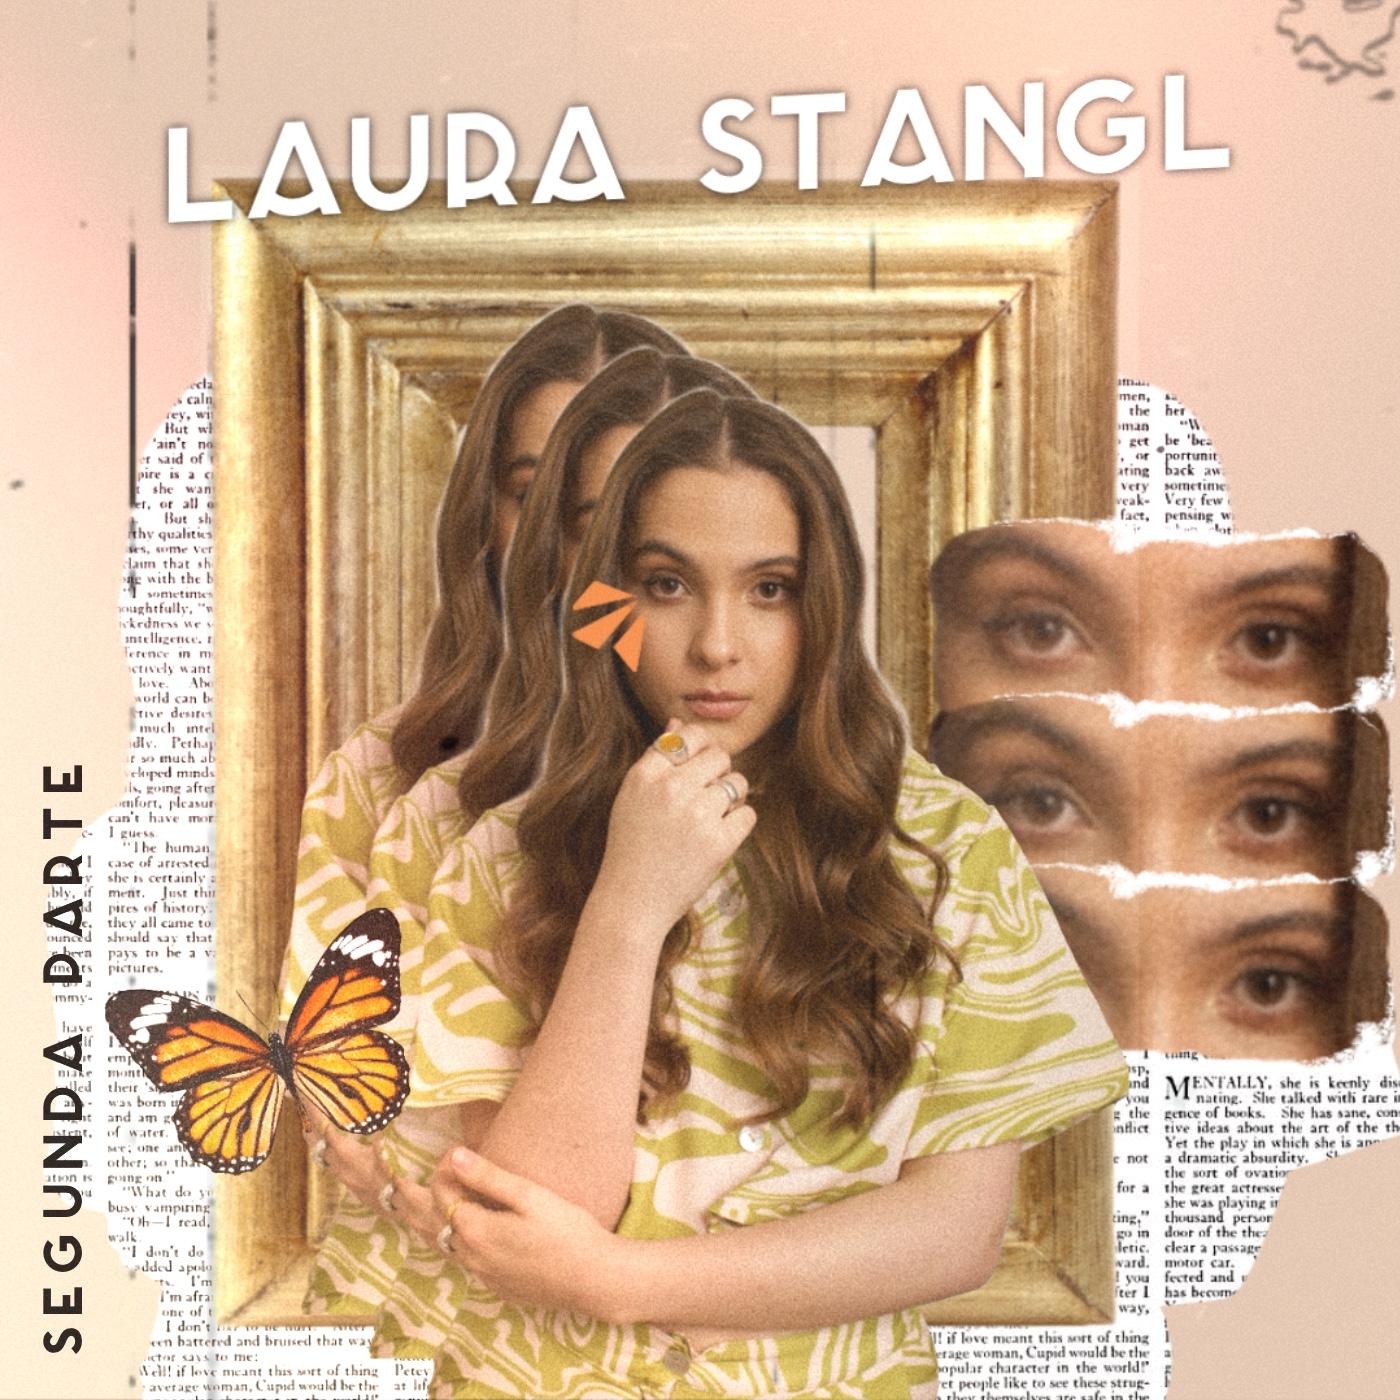 Laura Stangl